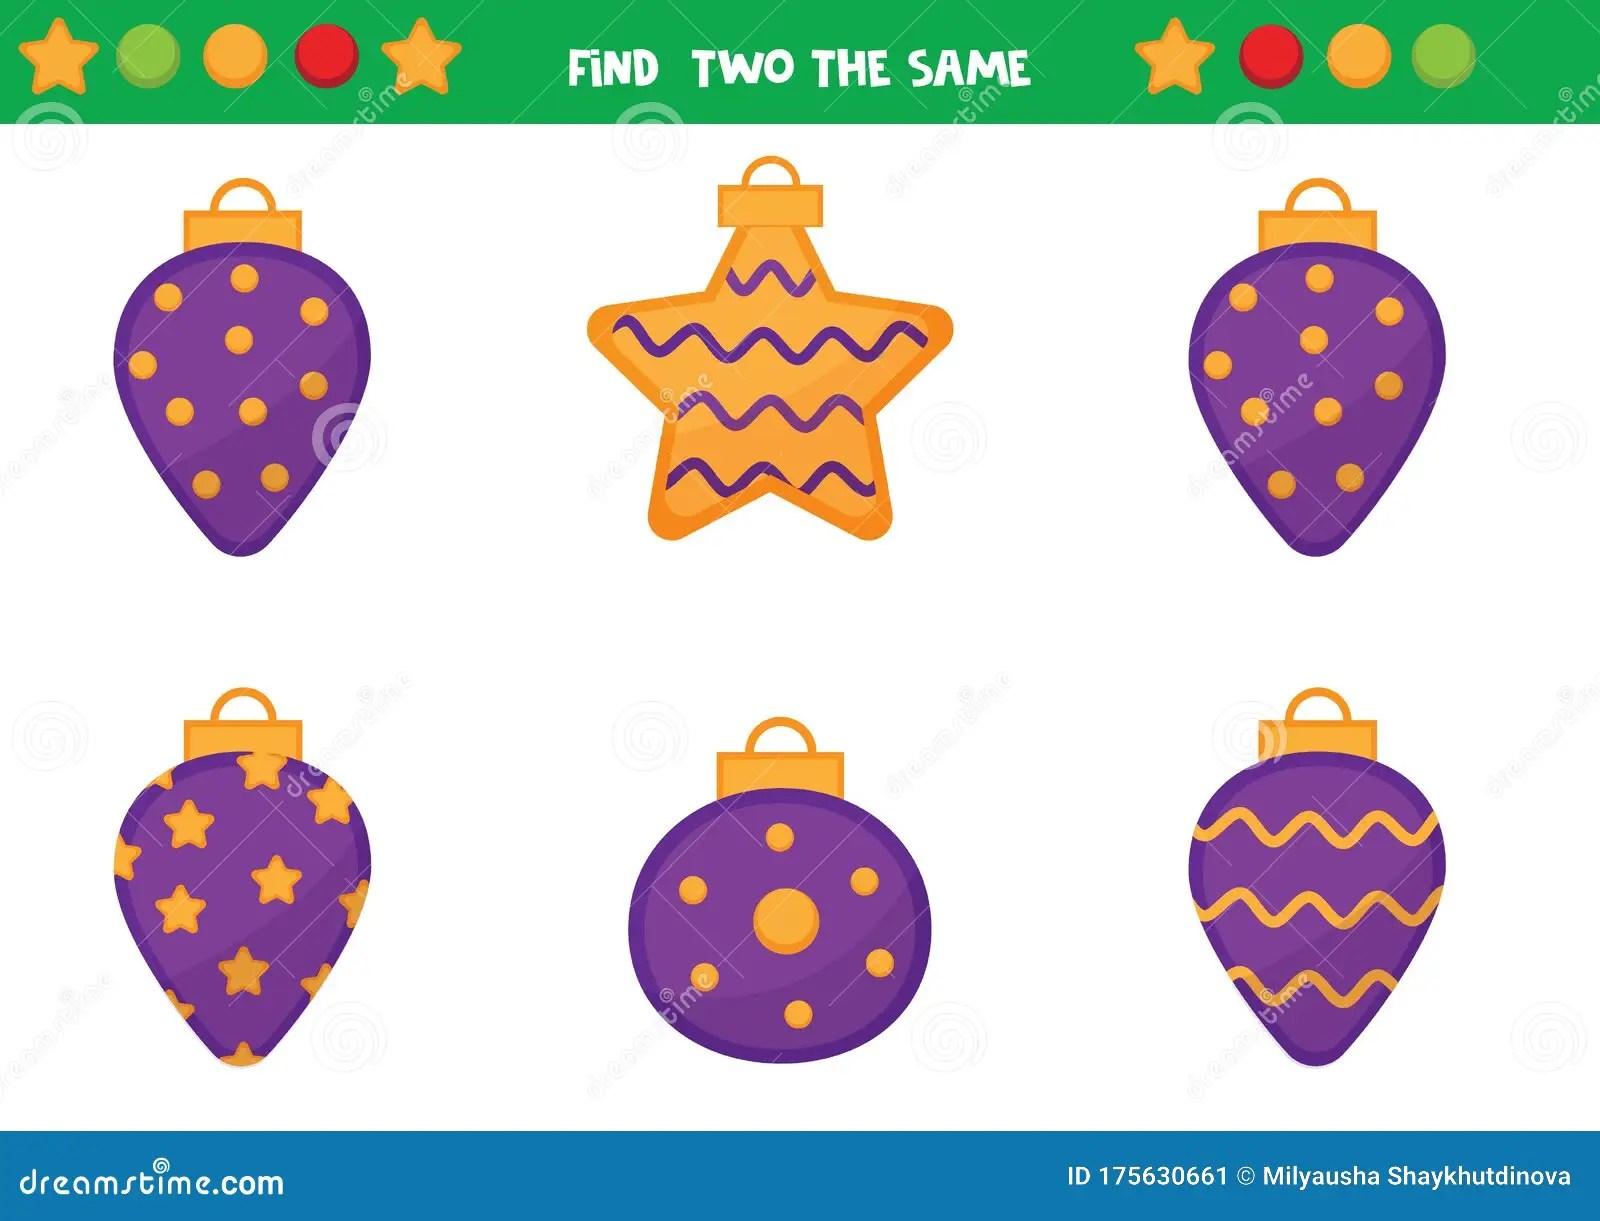 Educational Worksheet For Preschool Kids Find Two The